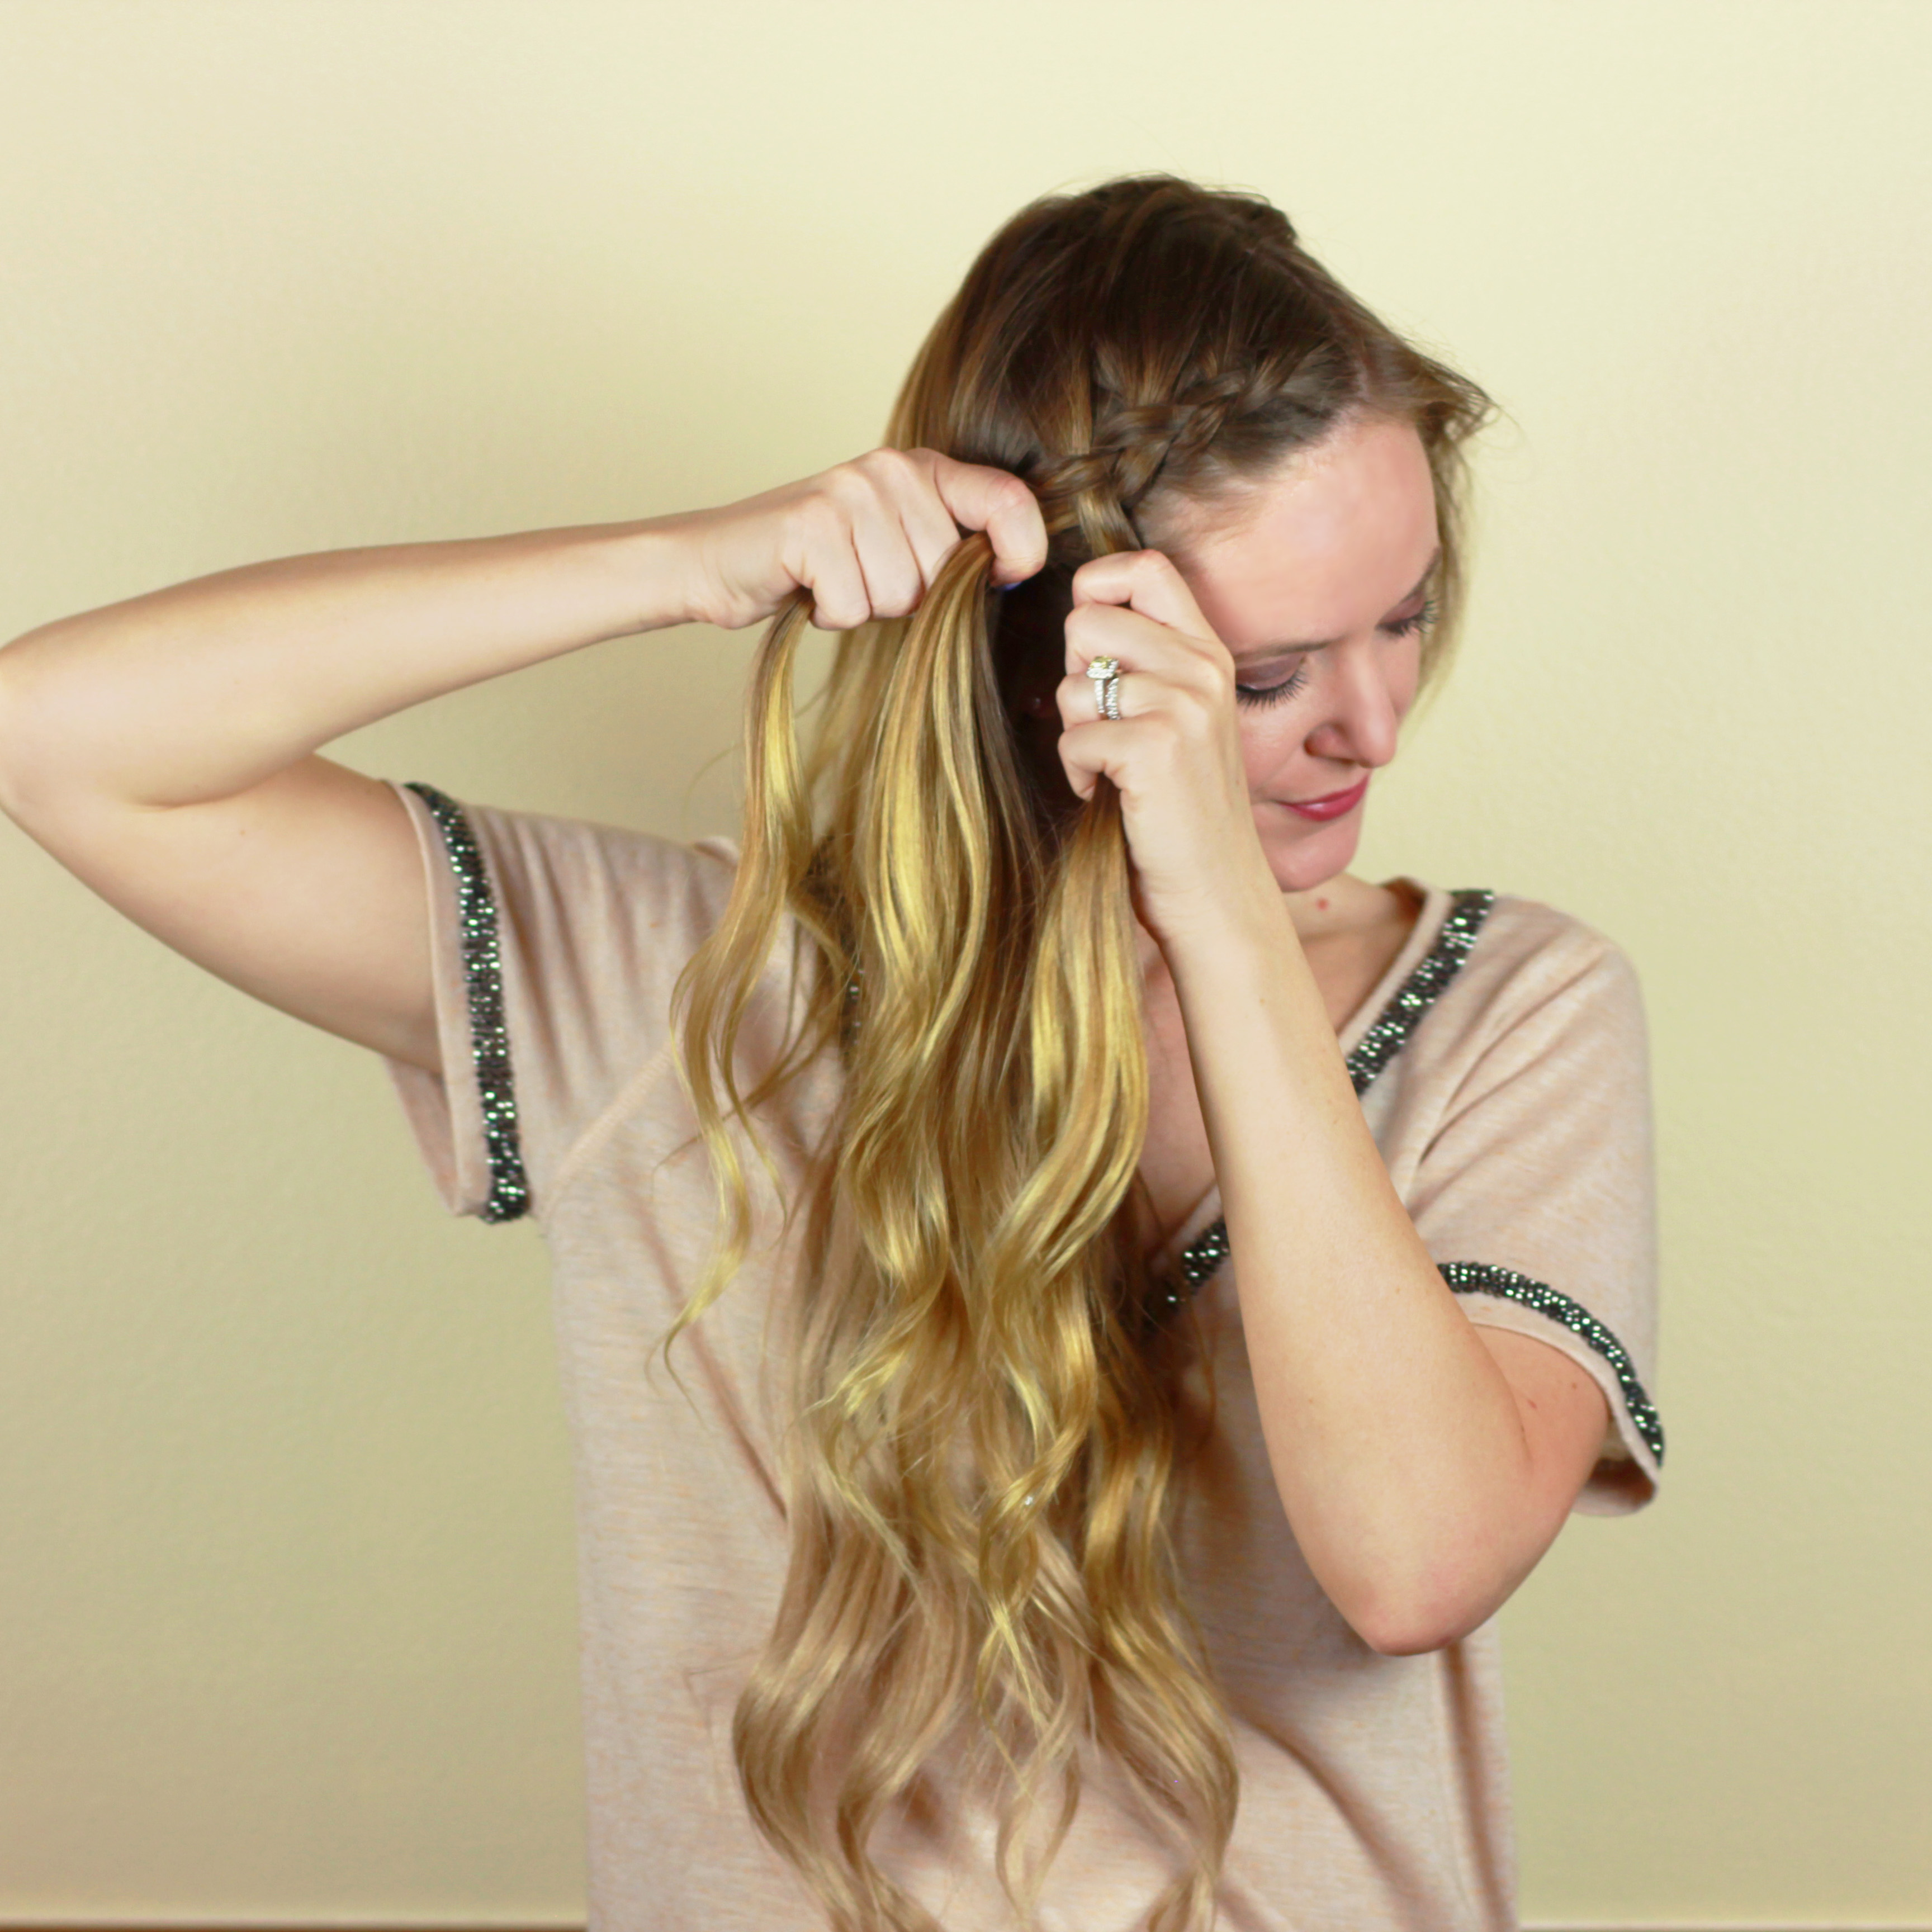 Dutch side braid tutorial upbeat soles orlando florida fashion orlando florida fashion blog does a side dutch braid tutorial using bellami hair extensions to get pmusecretfo Choice Image